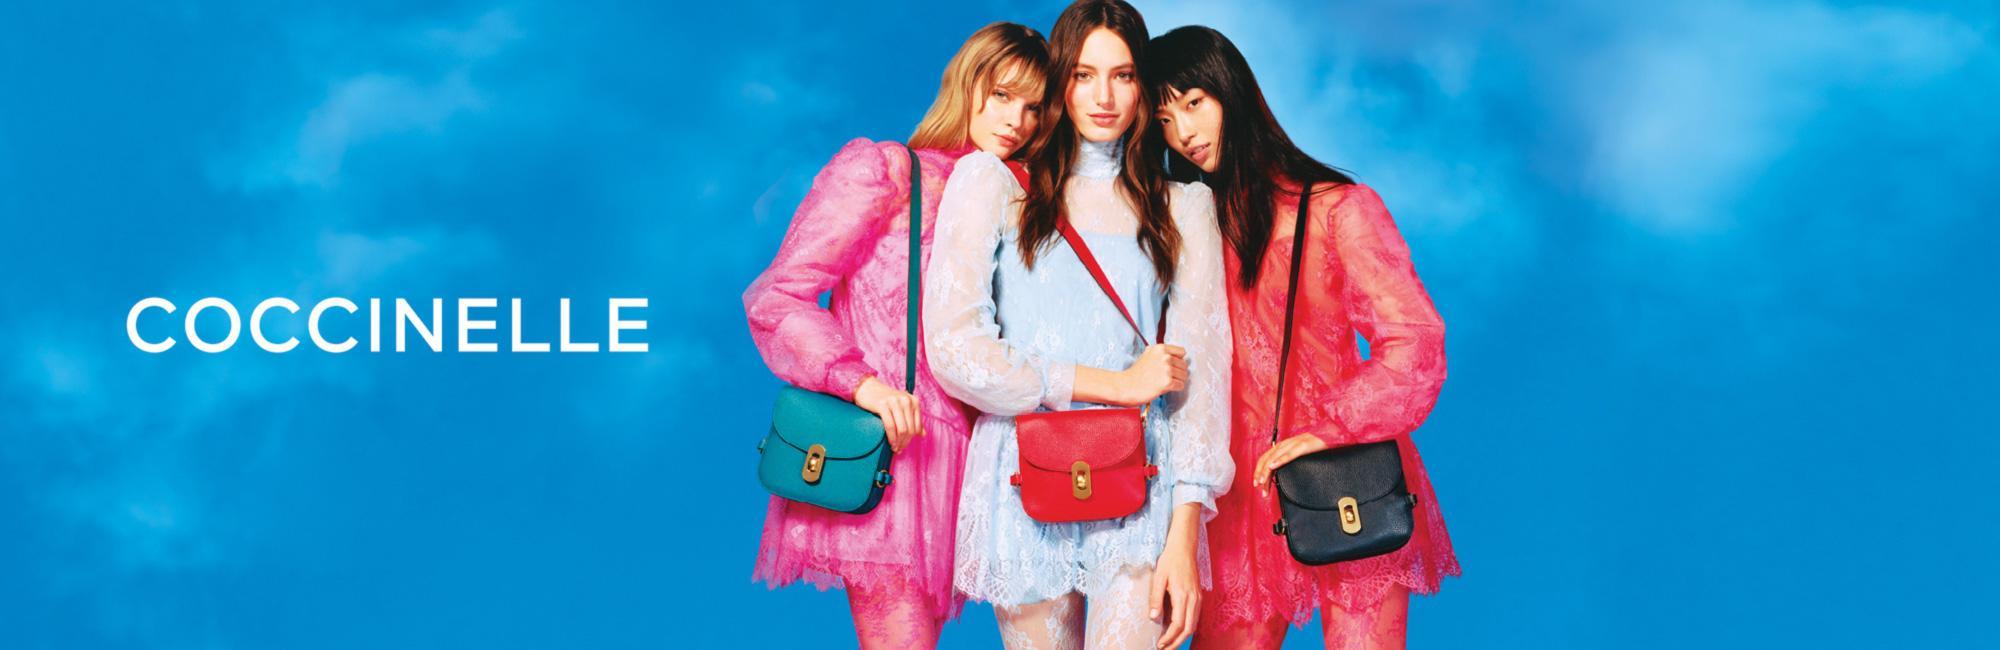 afad98d53eefdb Coccinelle Handbags and Purses | wardow.com